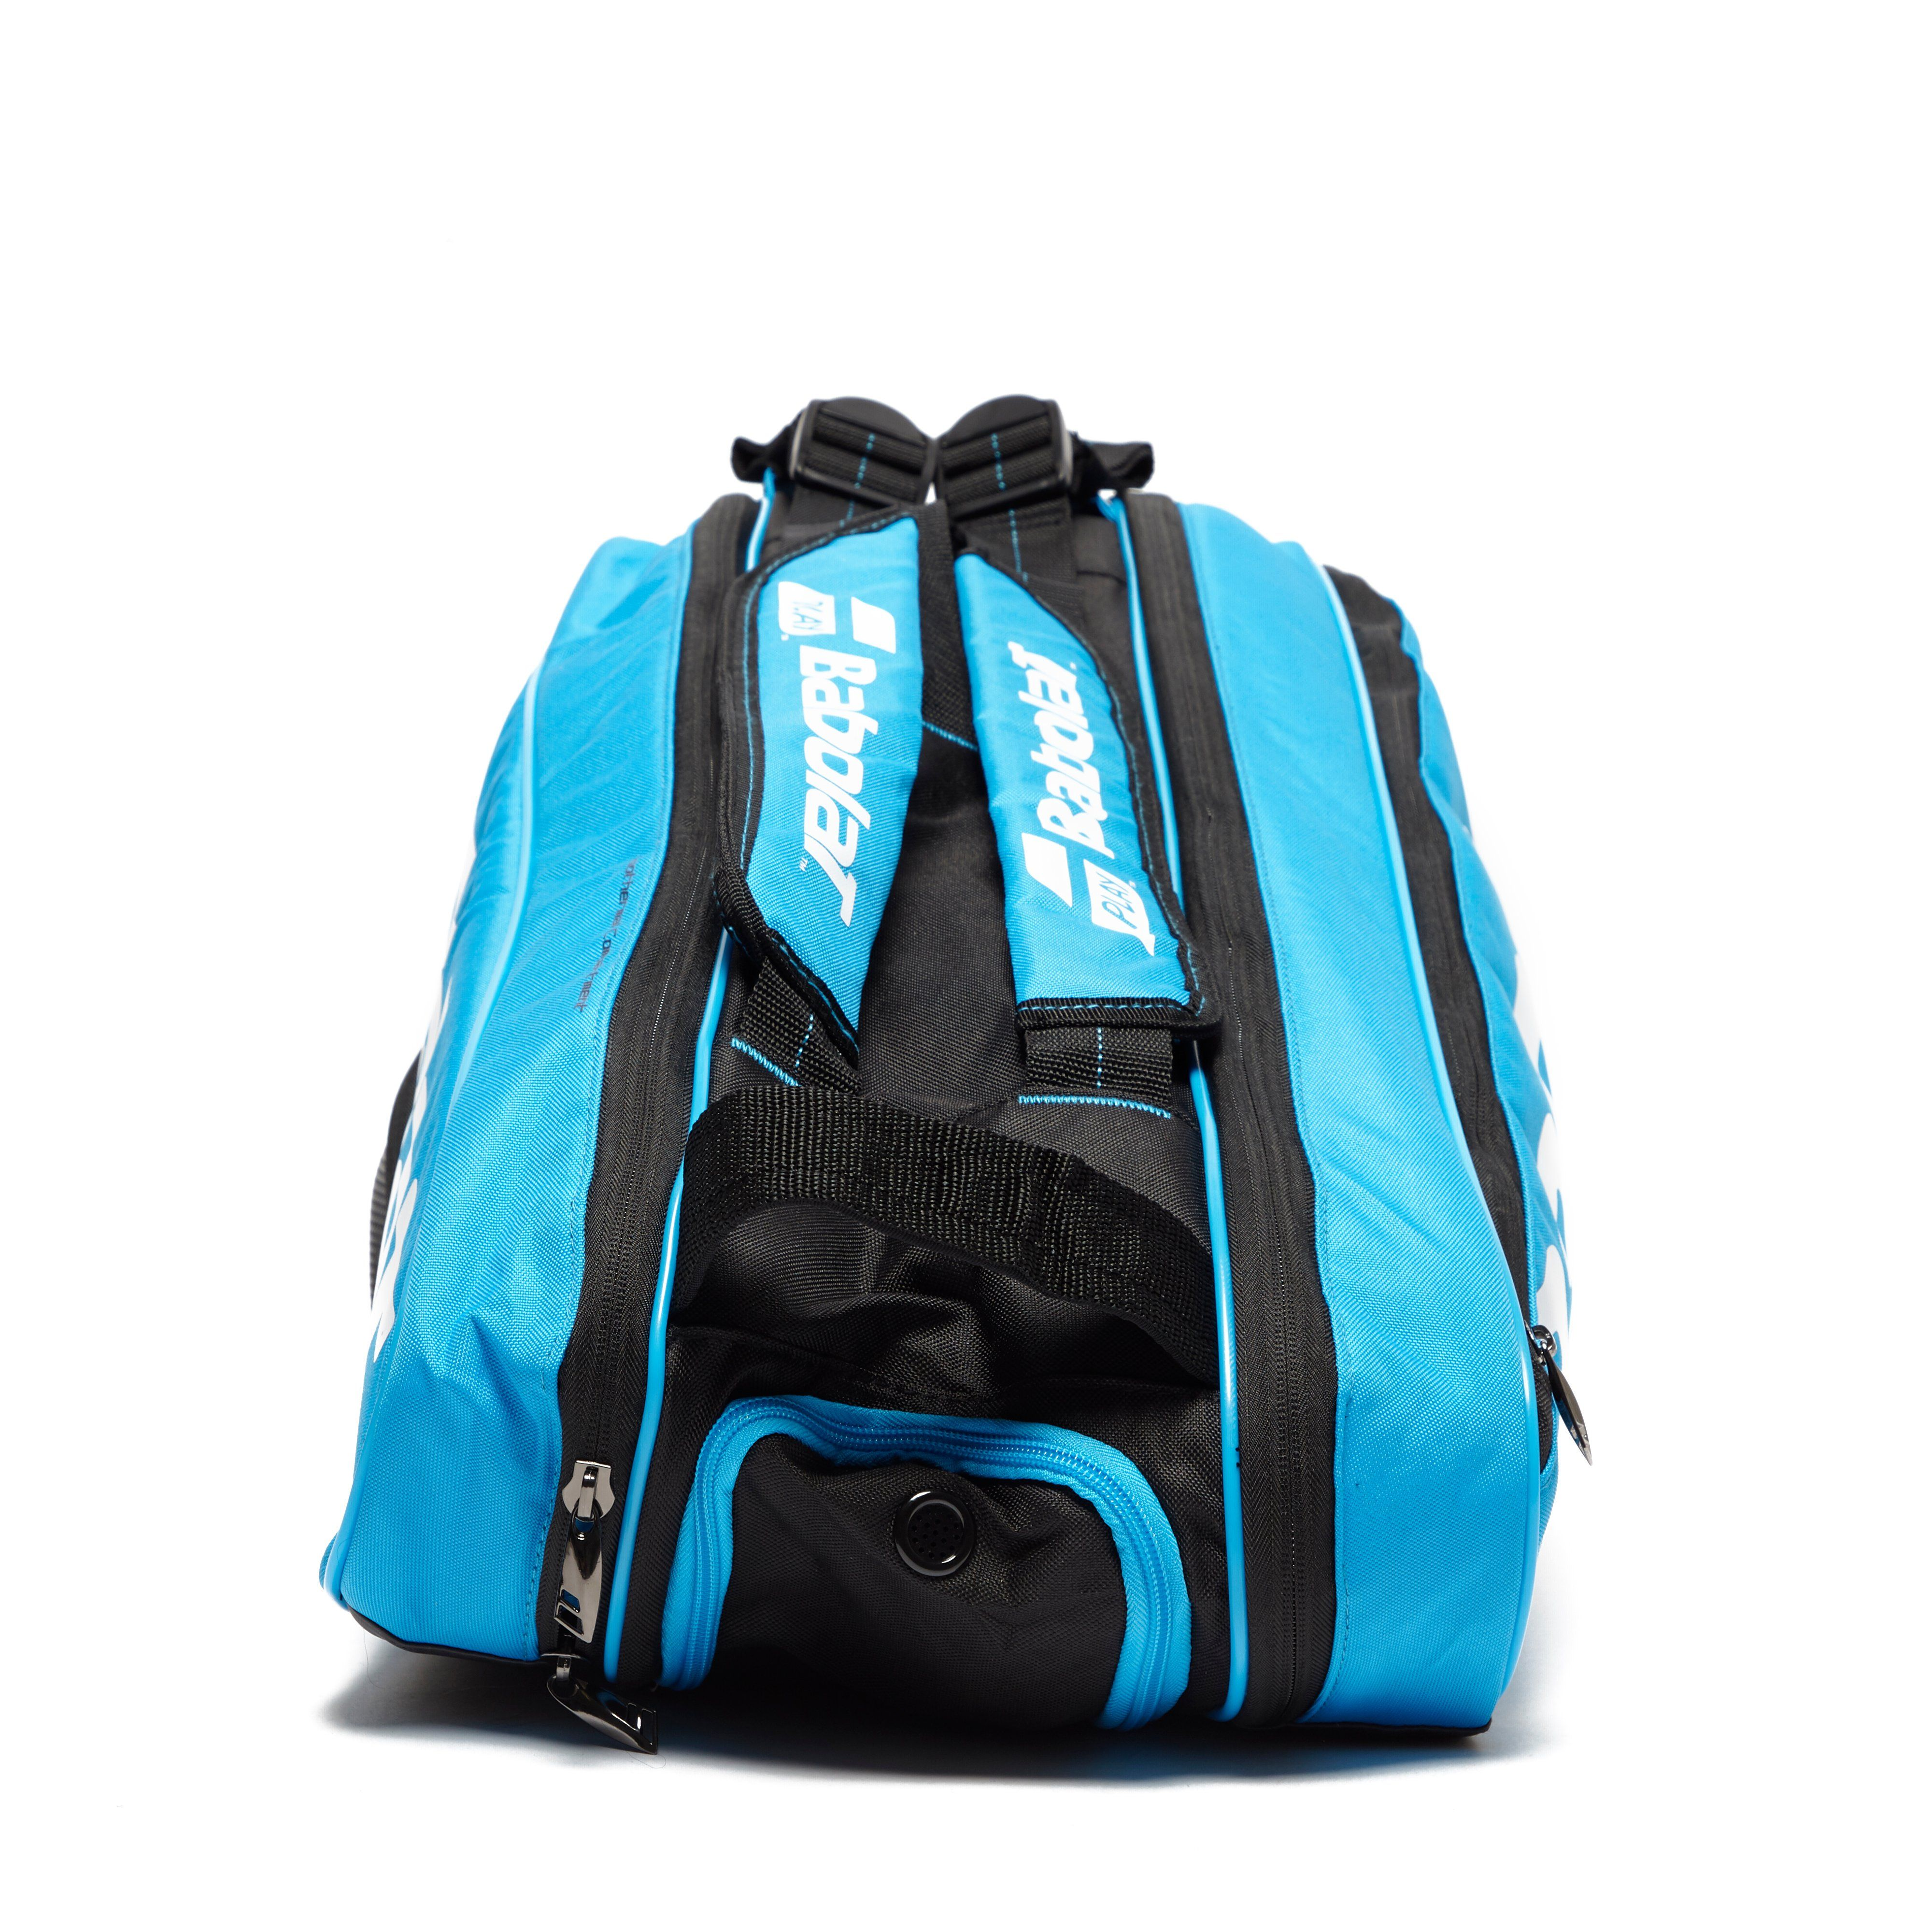 Babolat Pure Drive x6 Racket Bag